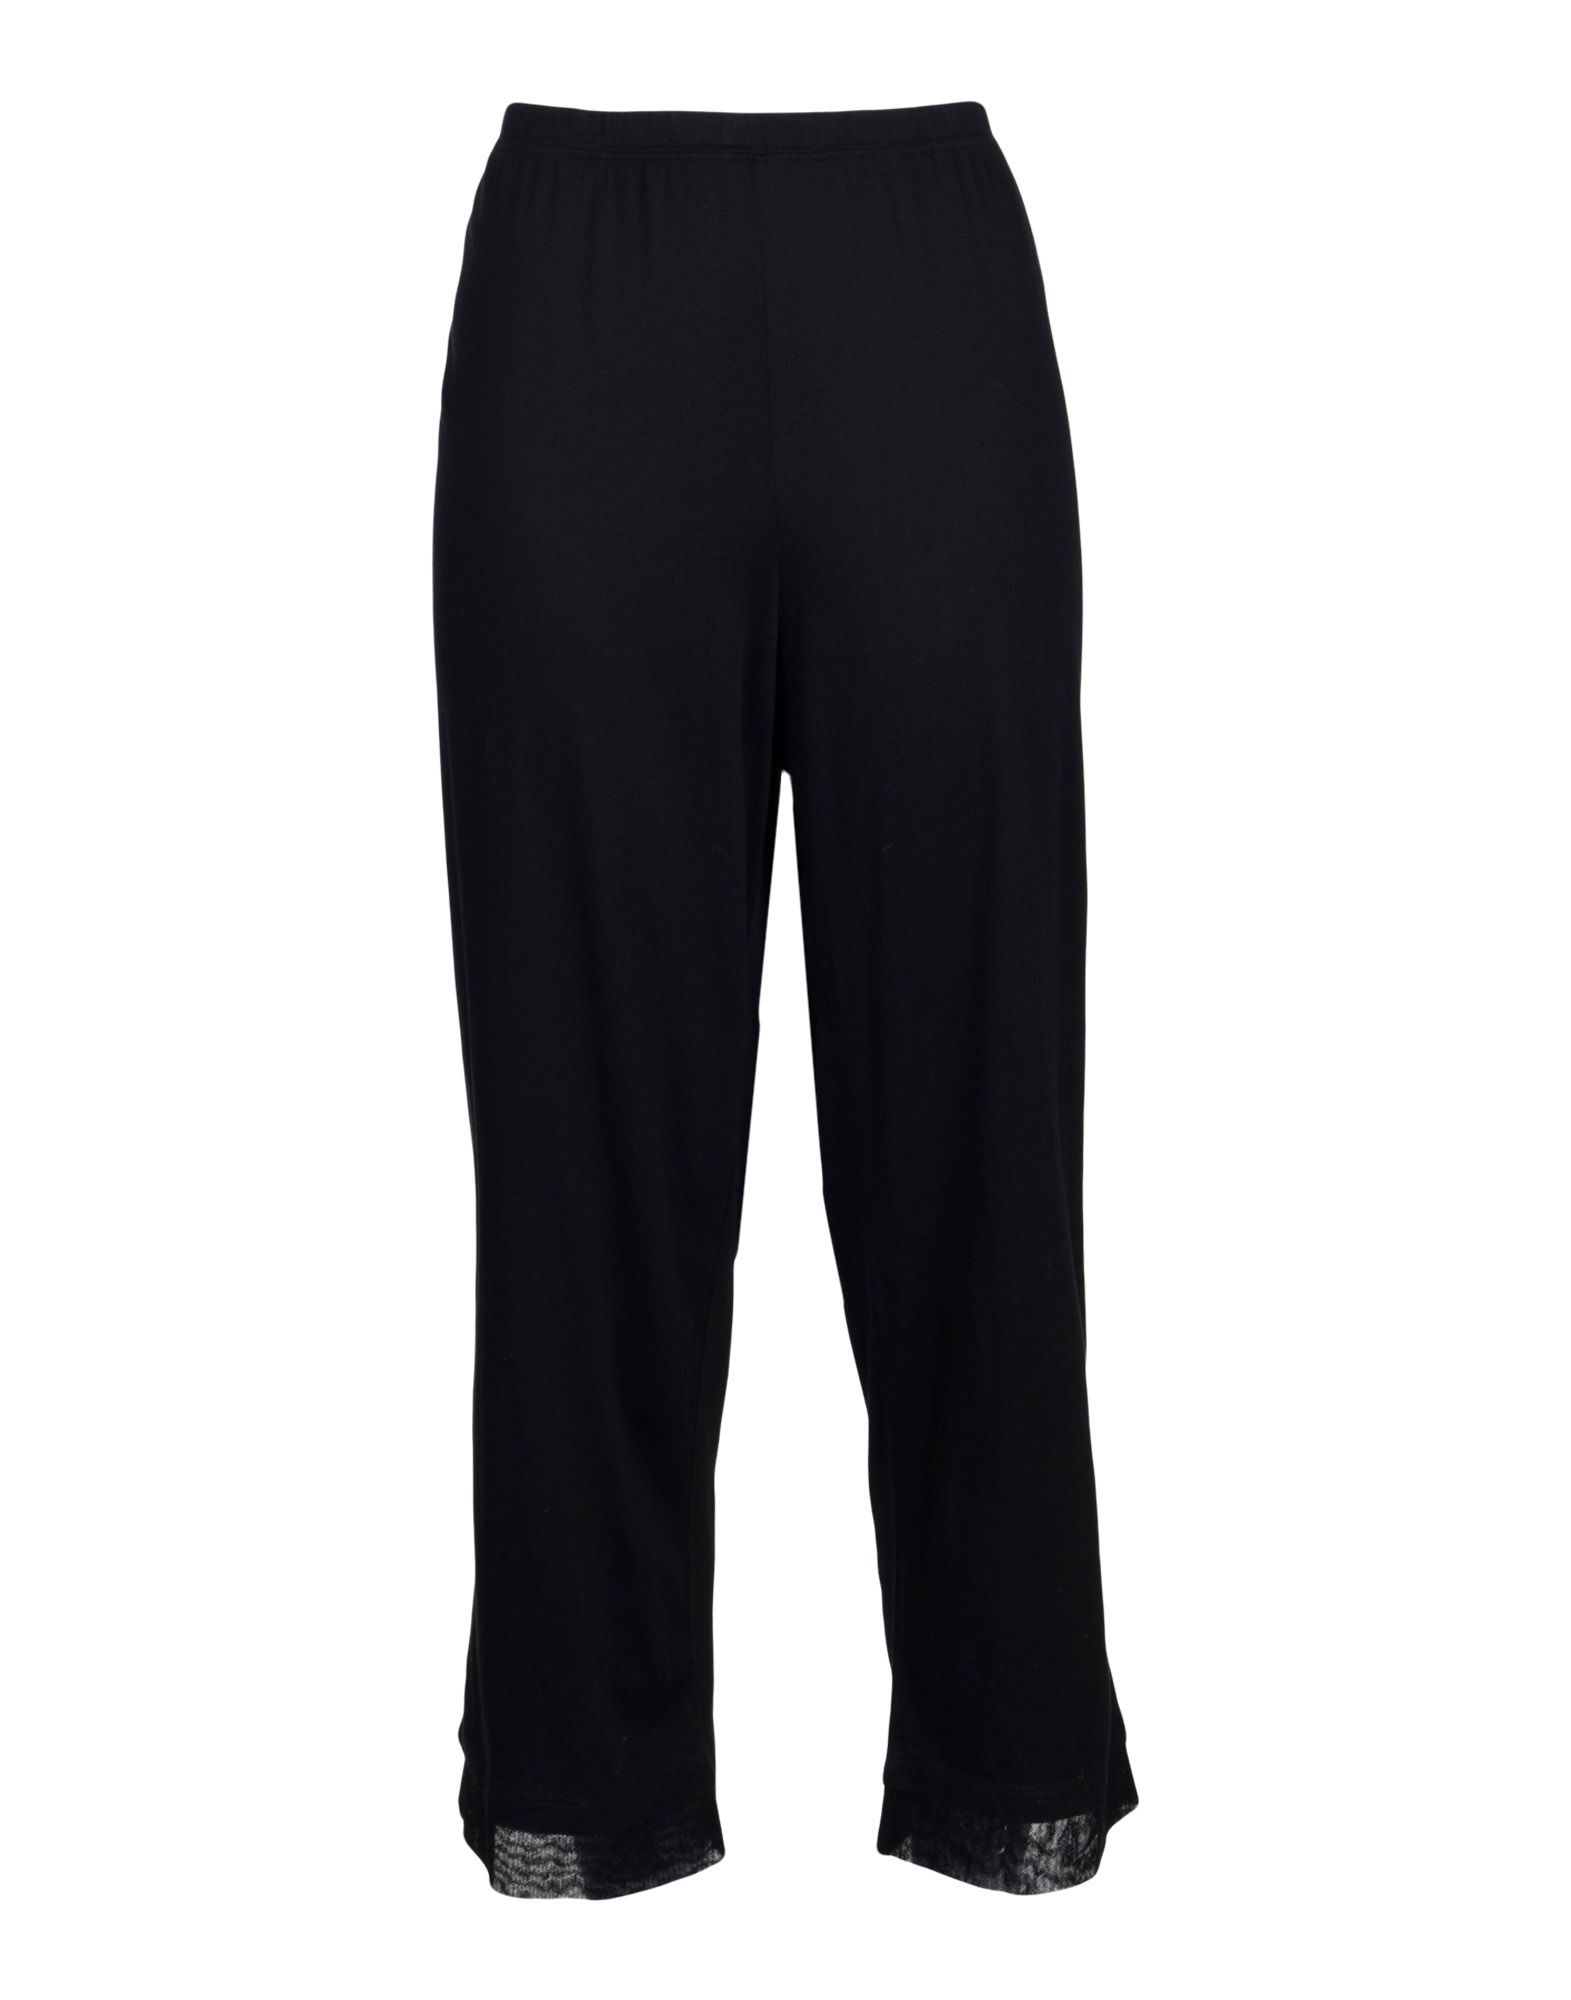 SKIN レディース パジャマ ブラック 4 ピマコットン 100%